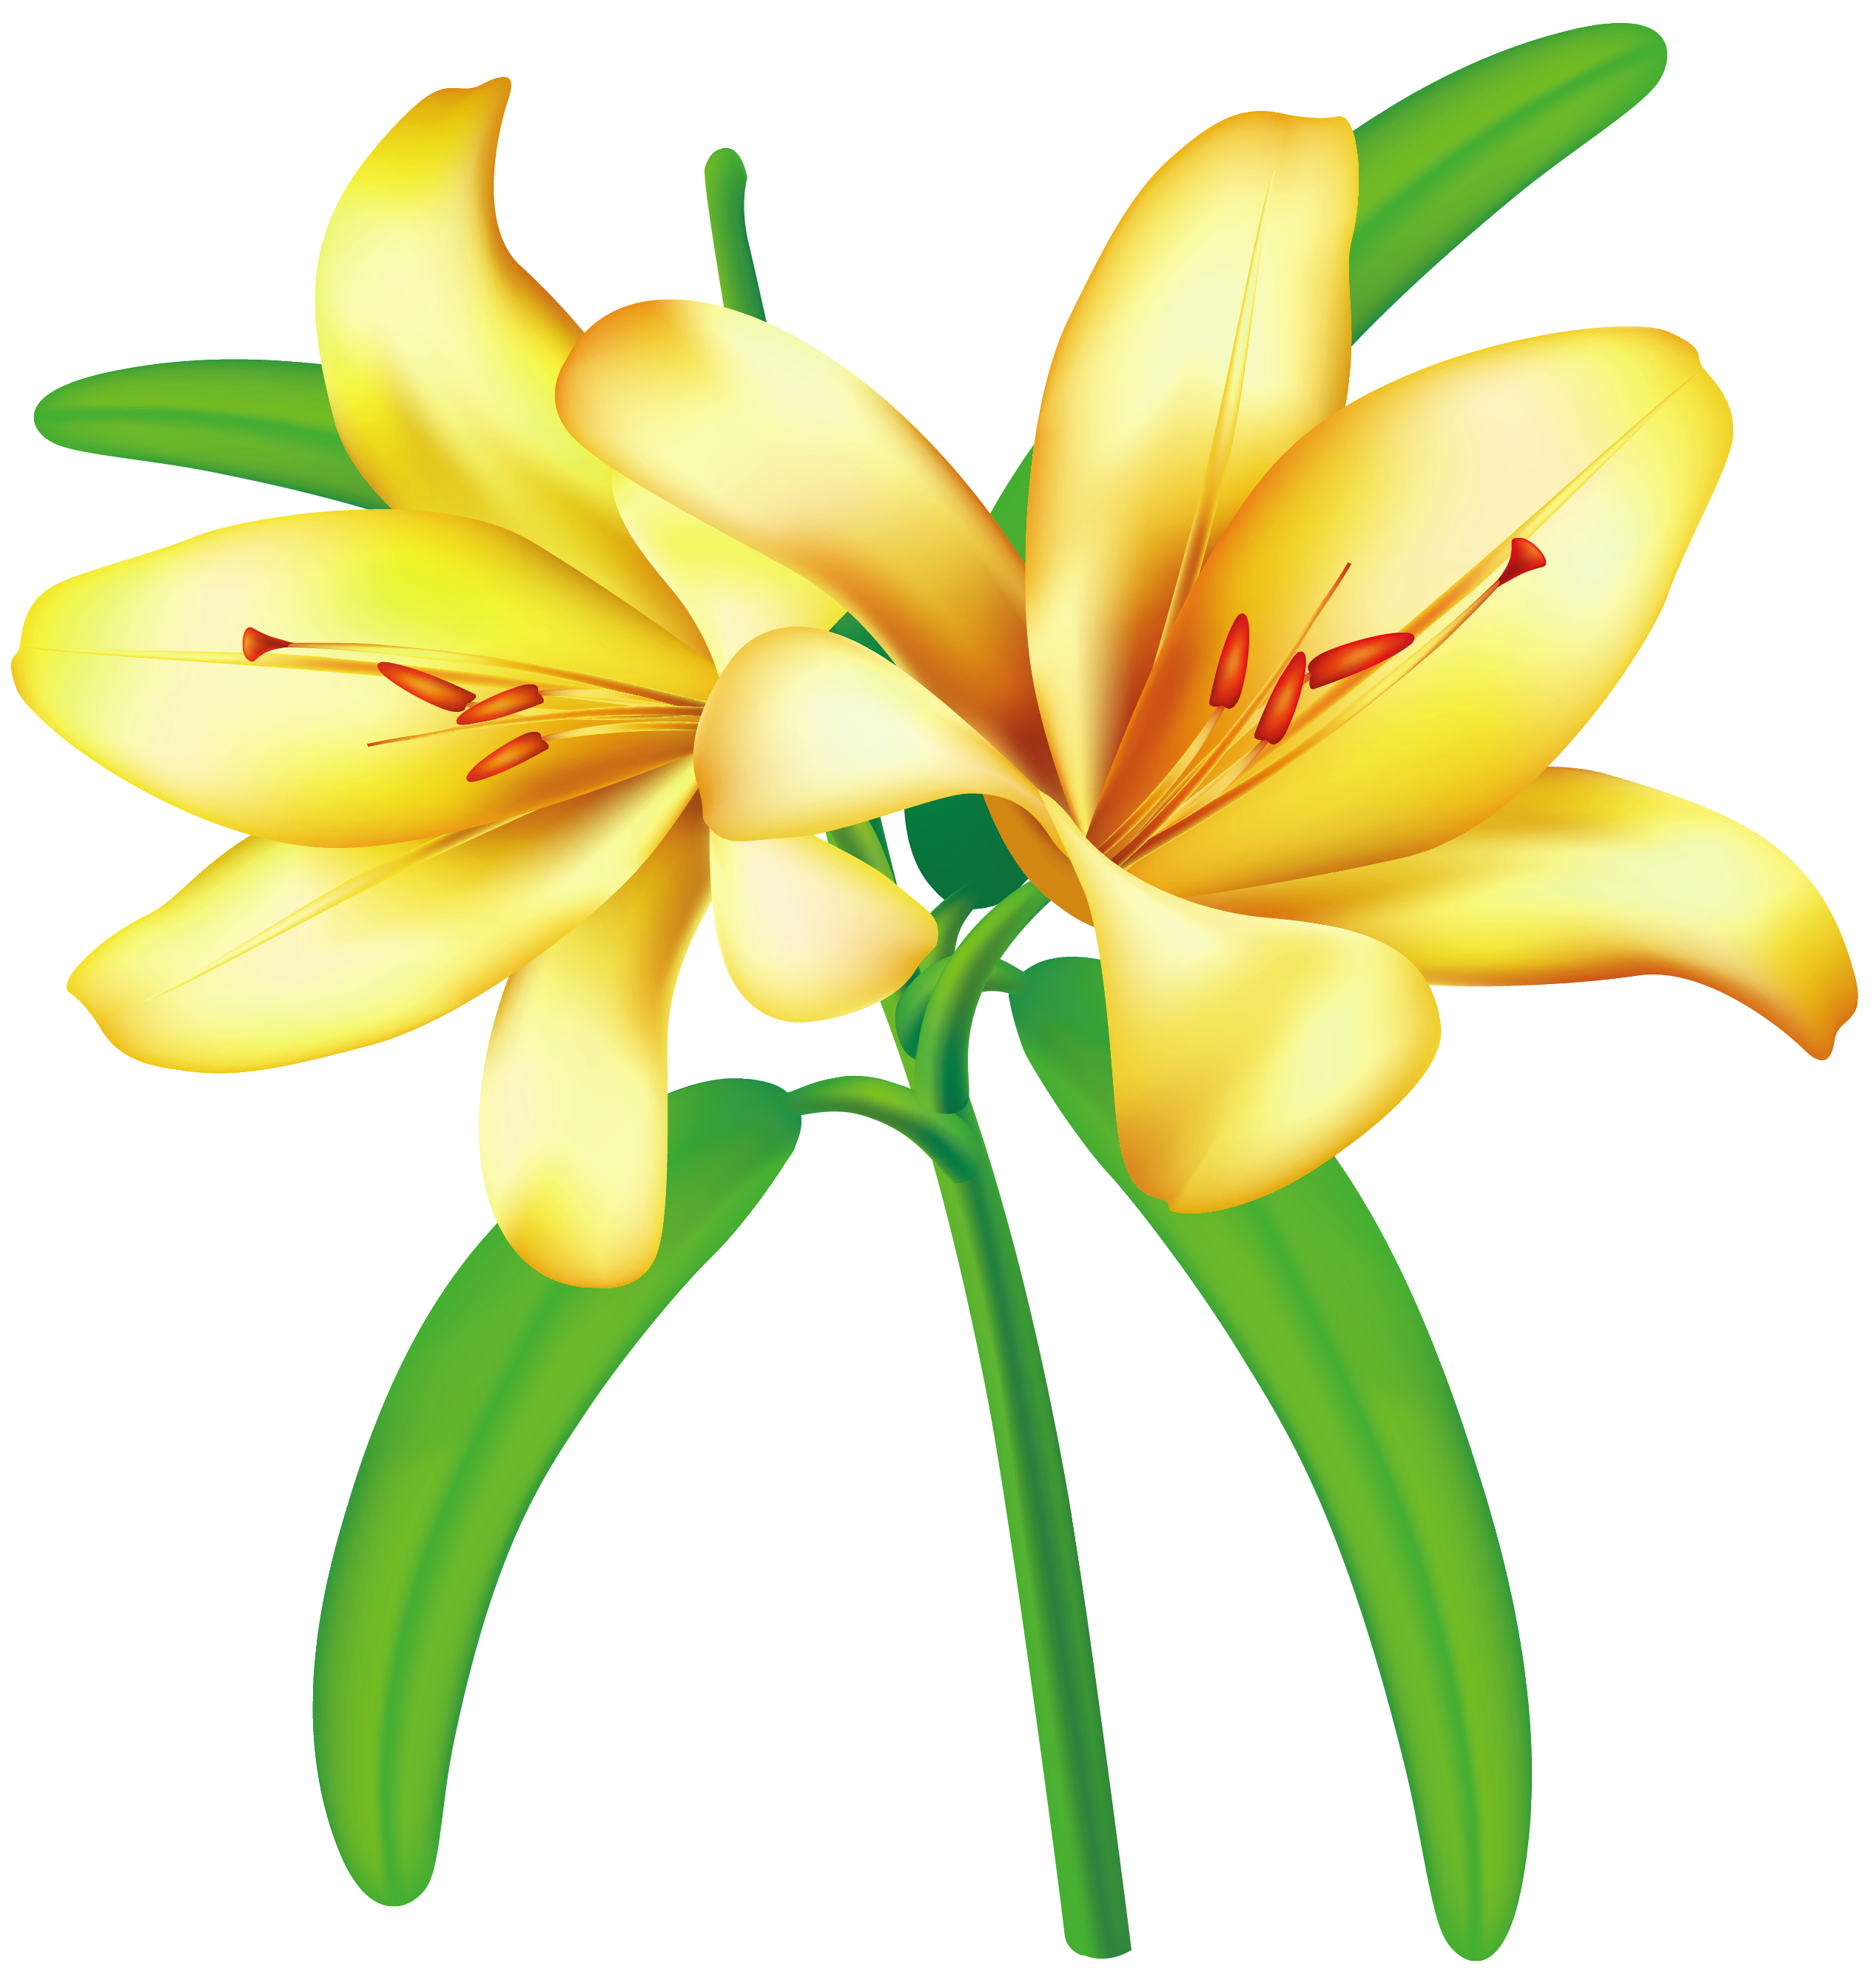 Pin af Marija / Mironna K. på Flowers